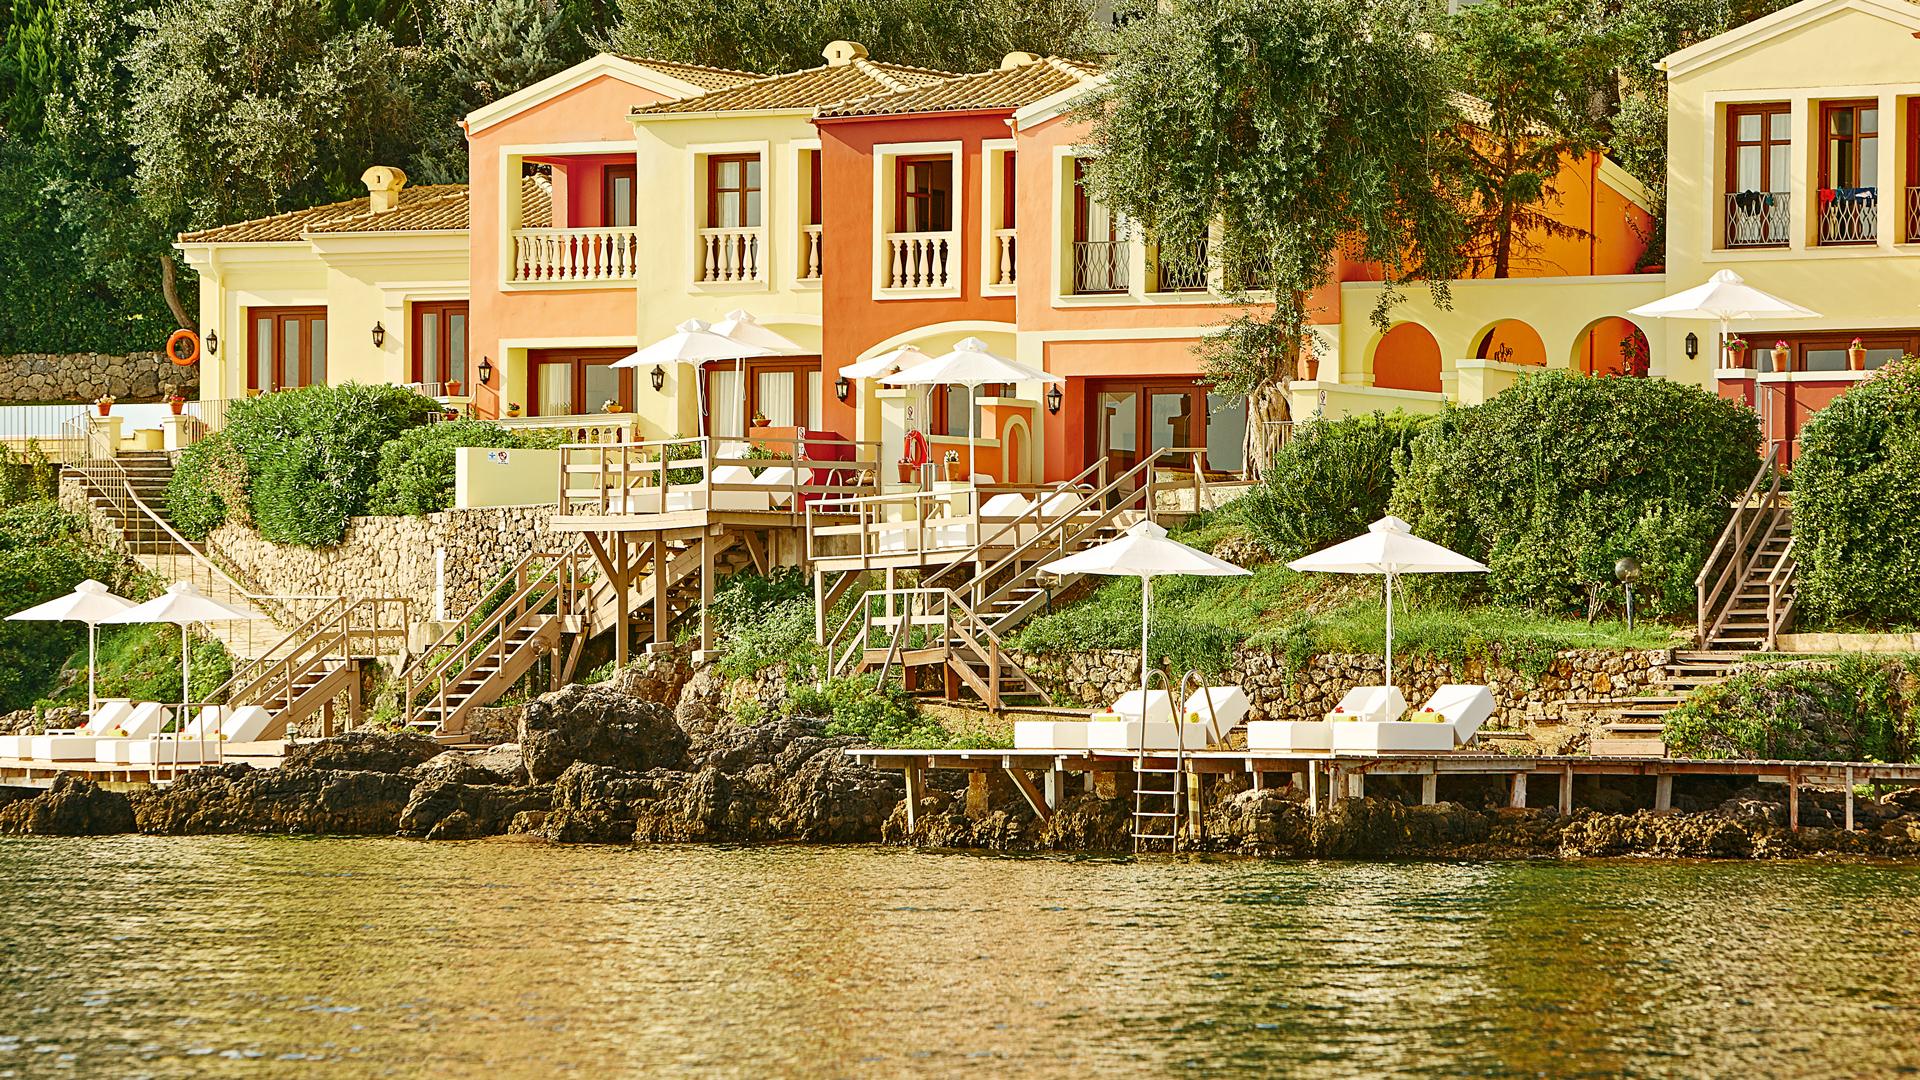 Corfu Imperial Luxury Hotel in Corfu